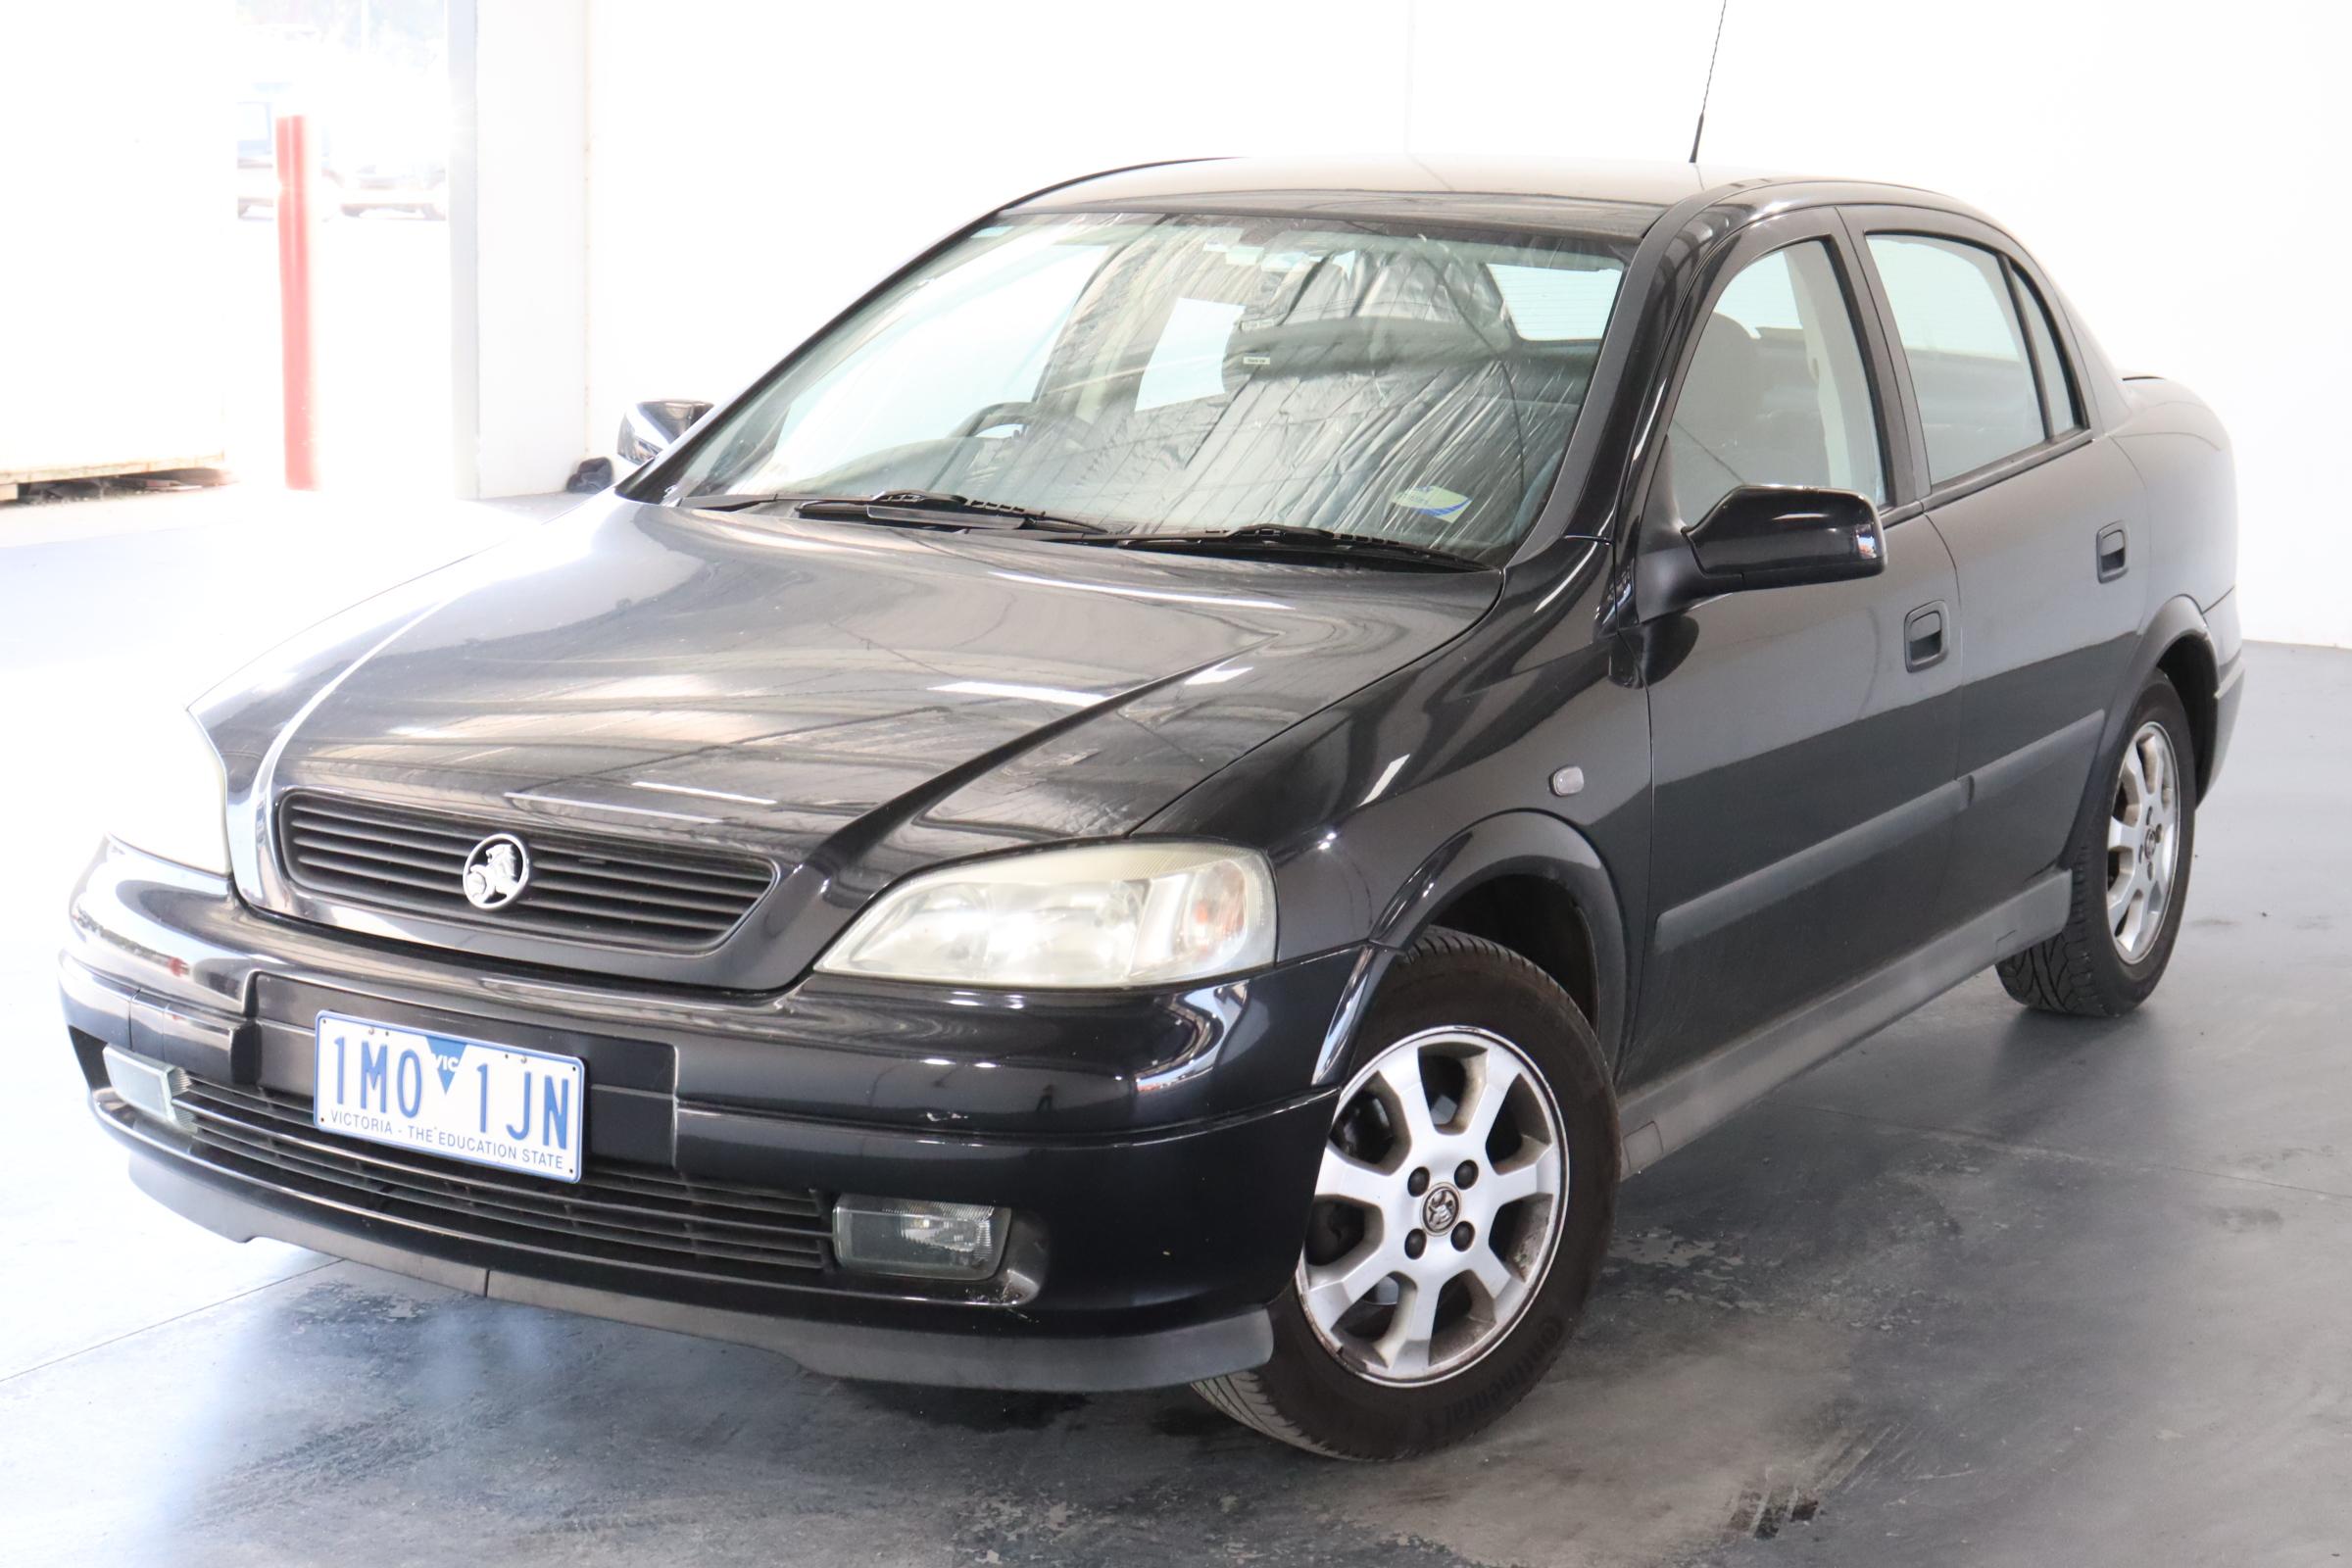 2003 Holden Astra City TS Manual Sedan